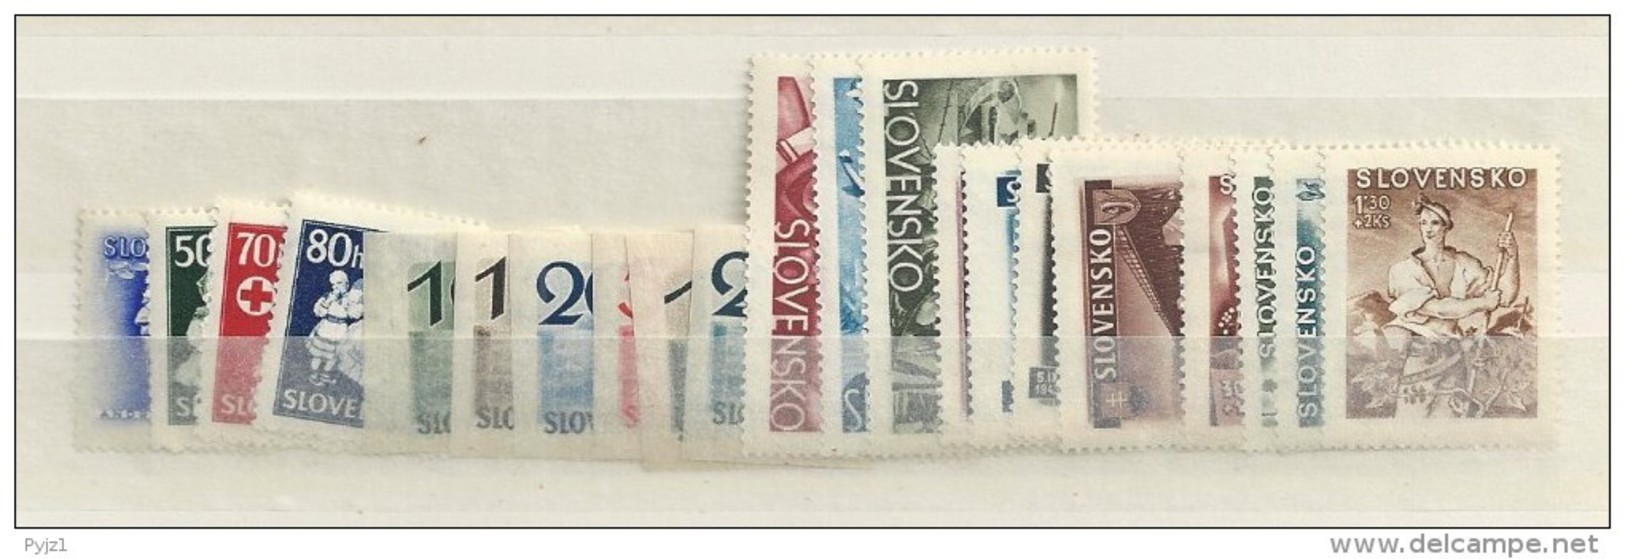 1943 MH Year Collection Slowakei, Slovensko - Slovakia